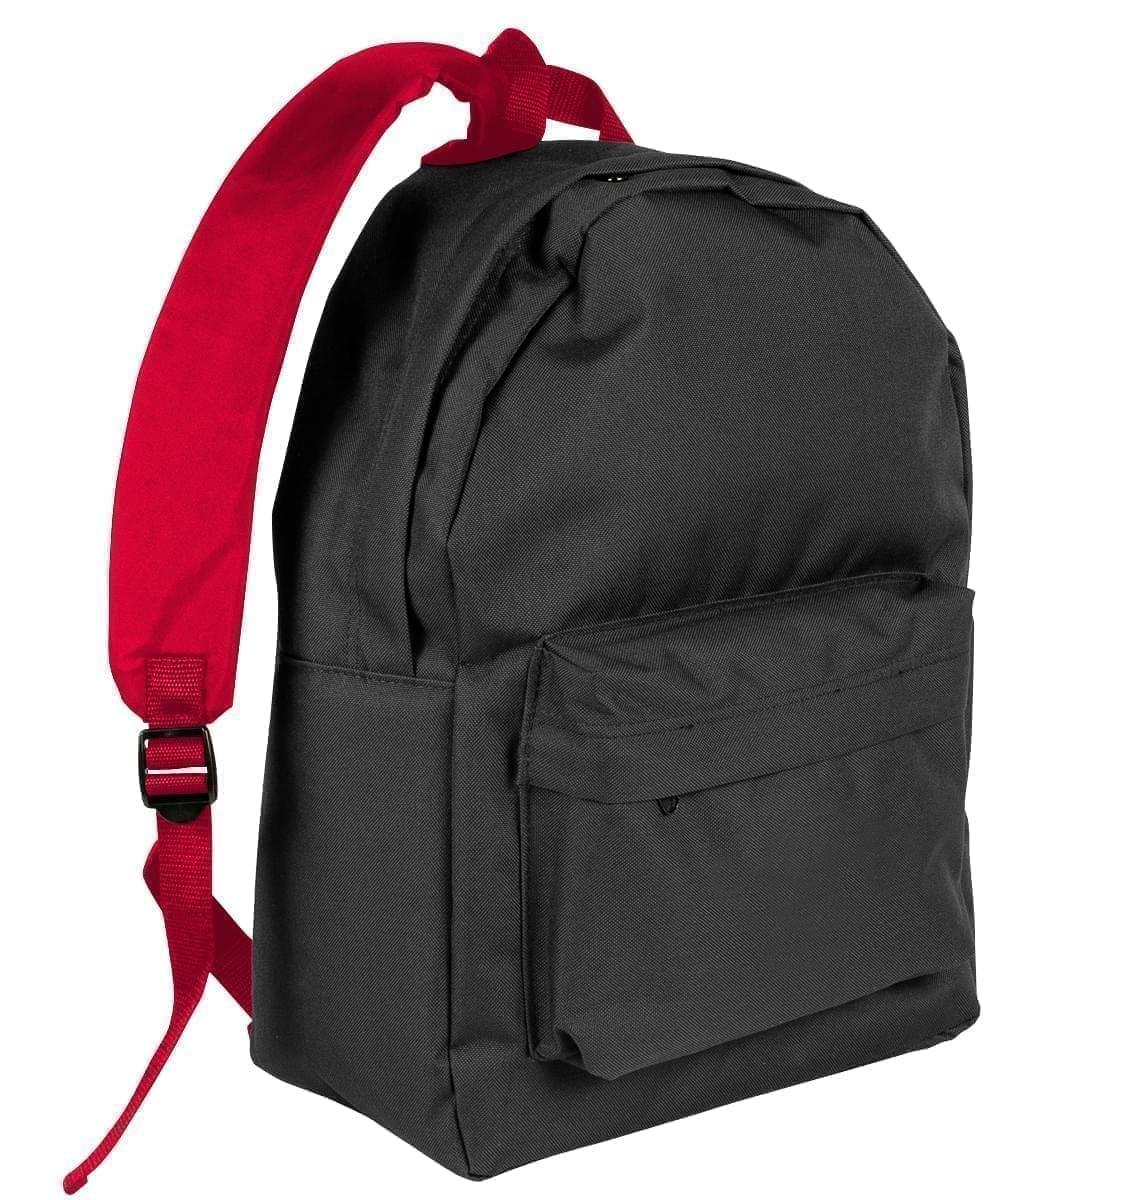 USA Made Nylon Poly Backpack Knapsacks, Black-Red, 8960-AO2